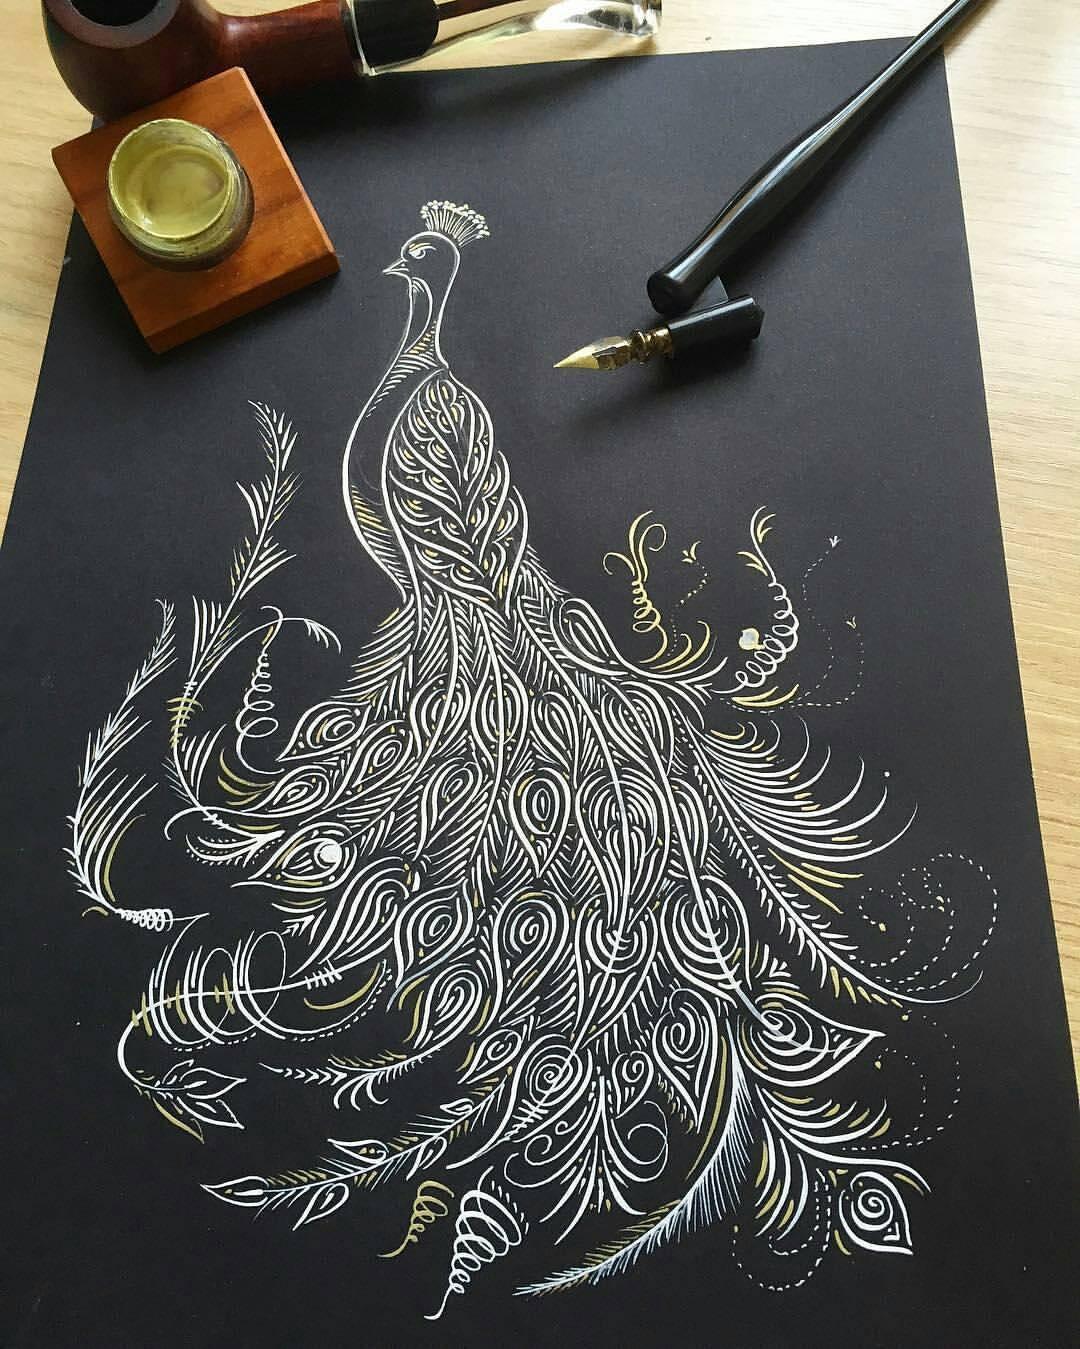 Iamtrait calligraphy masters flourishing calligram by